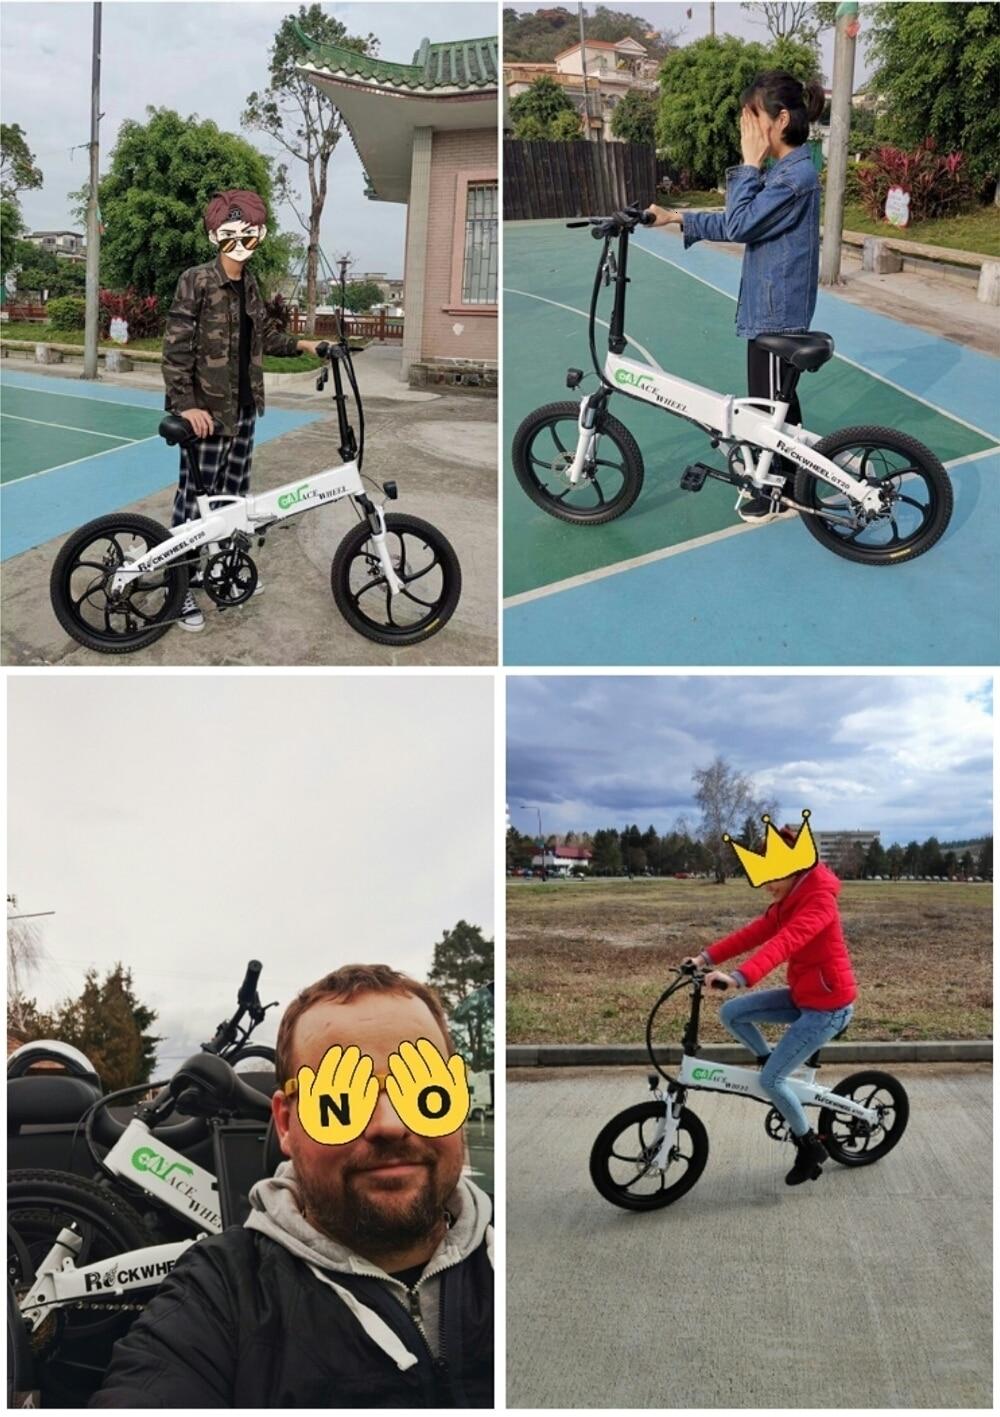 Stock & Russia Europe 20'' Electric Folding Bike 48V Motor 7 Speed gears E-Bike Front Rear Disc Brake Magnesium Alloy Wheel 6